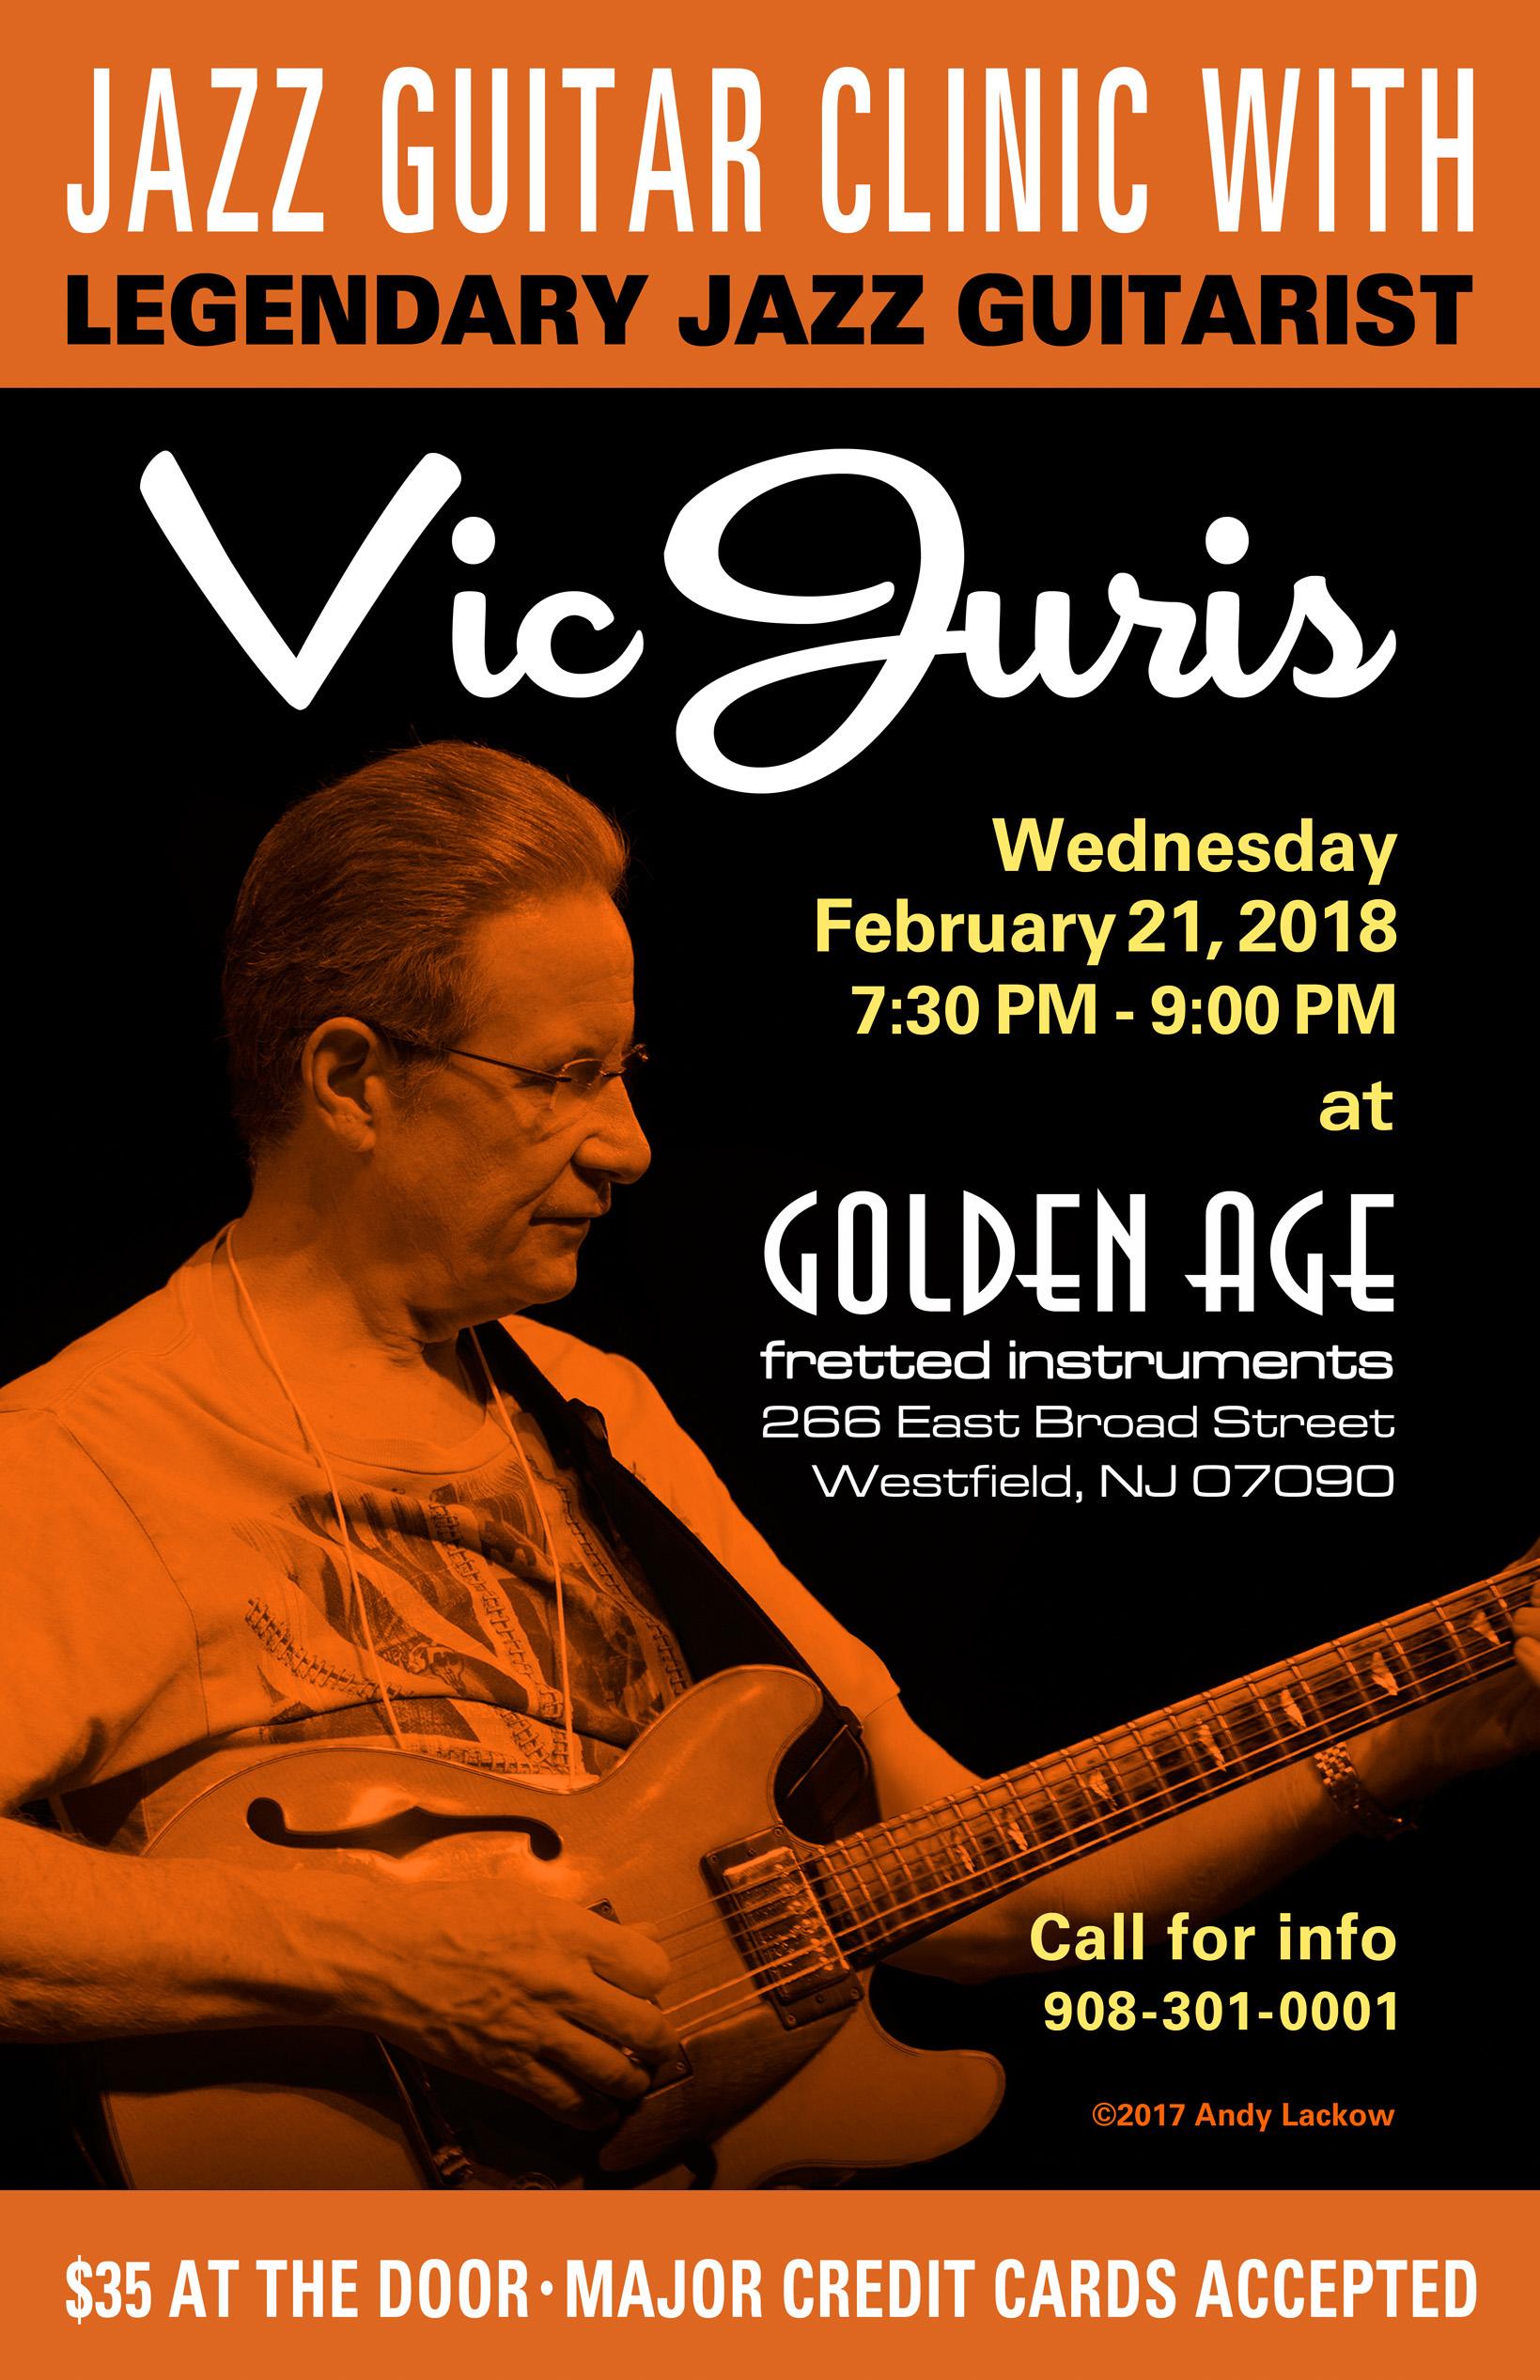 Vic Juris Jazz Guitar Clinic